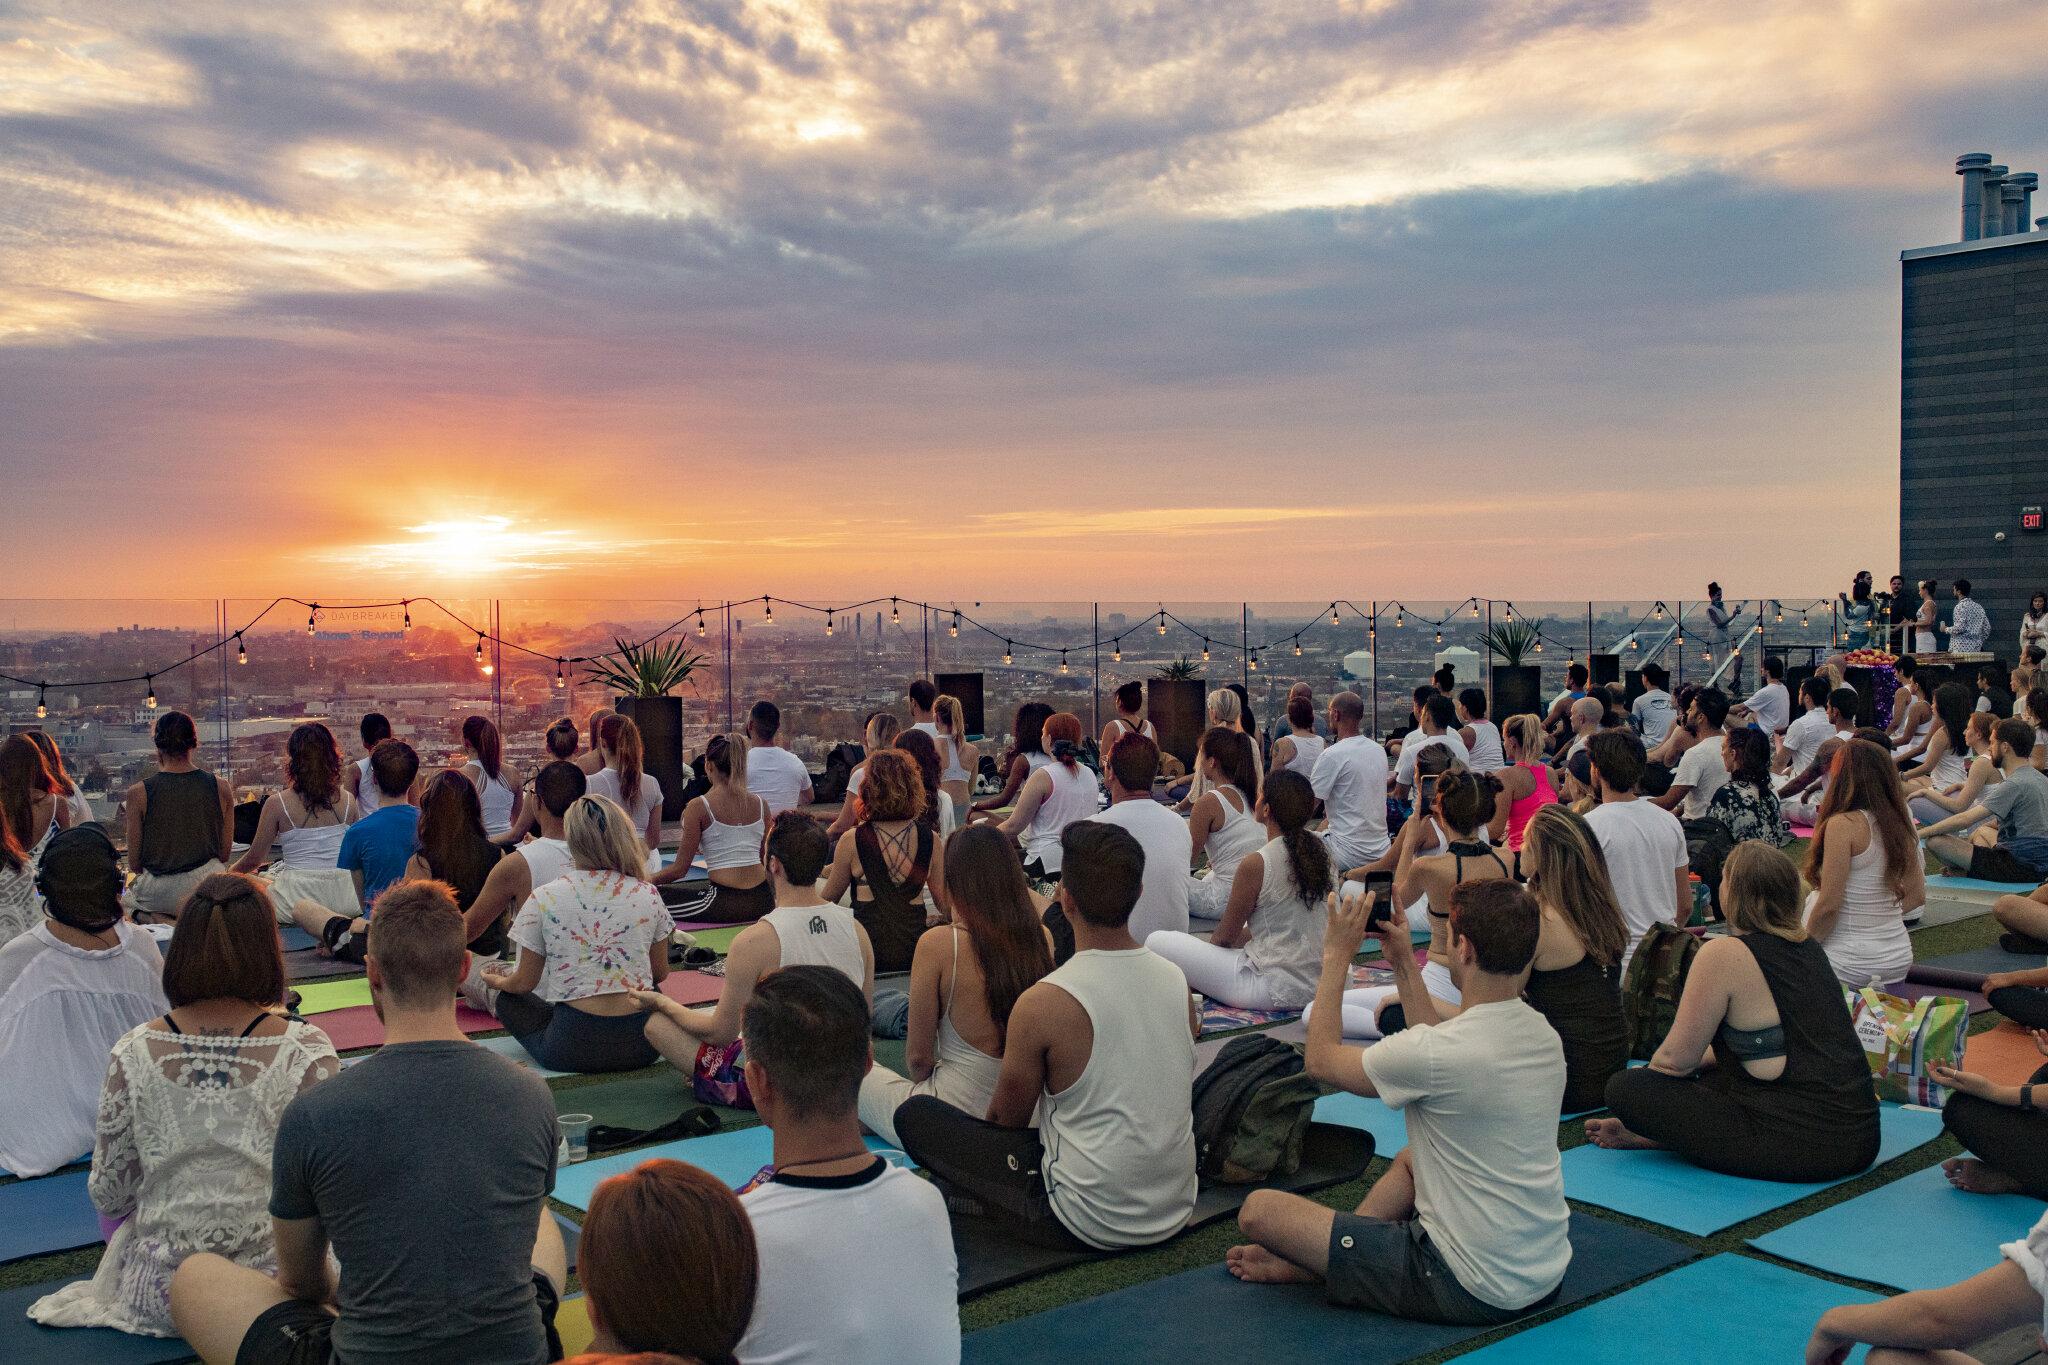 A post work Monday decompression kick it to help mitigate employee stress and address mental health, using sound meditation + yoga + vibes.